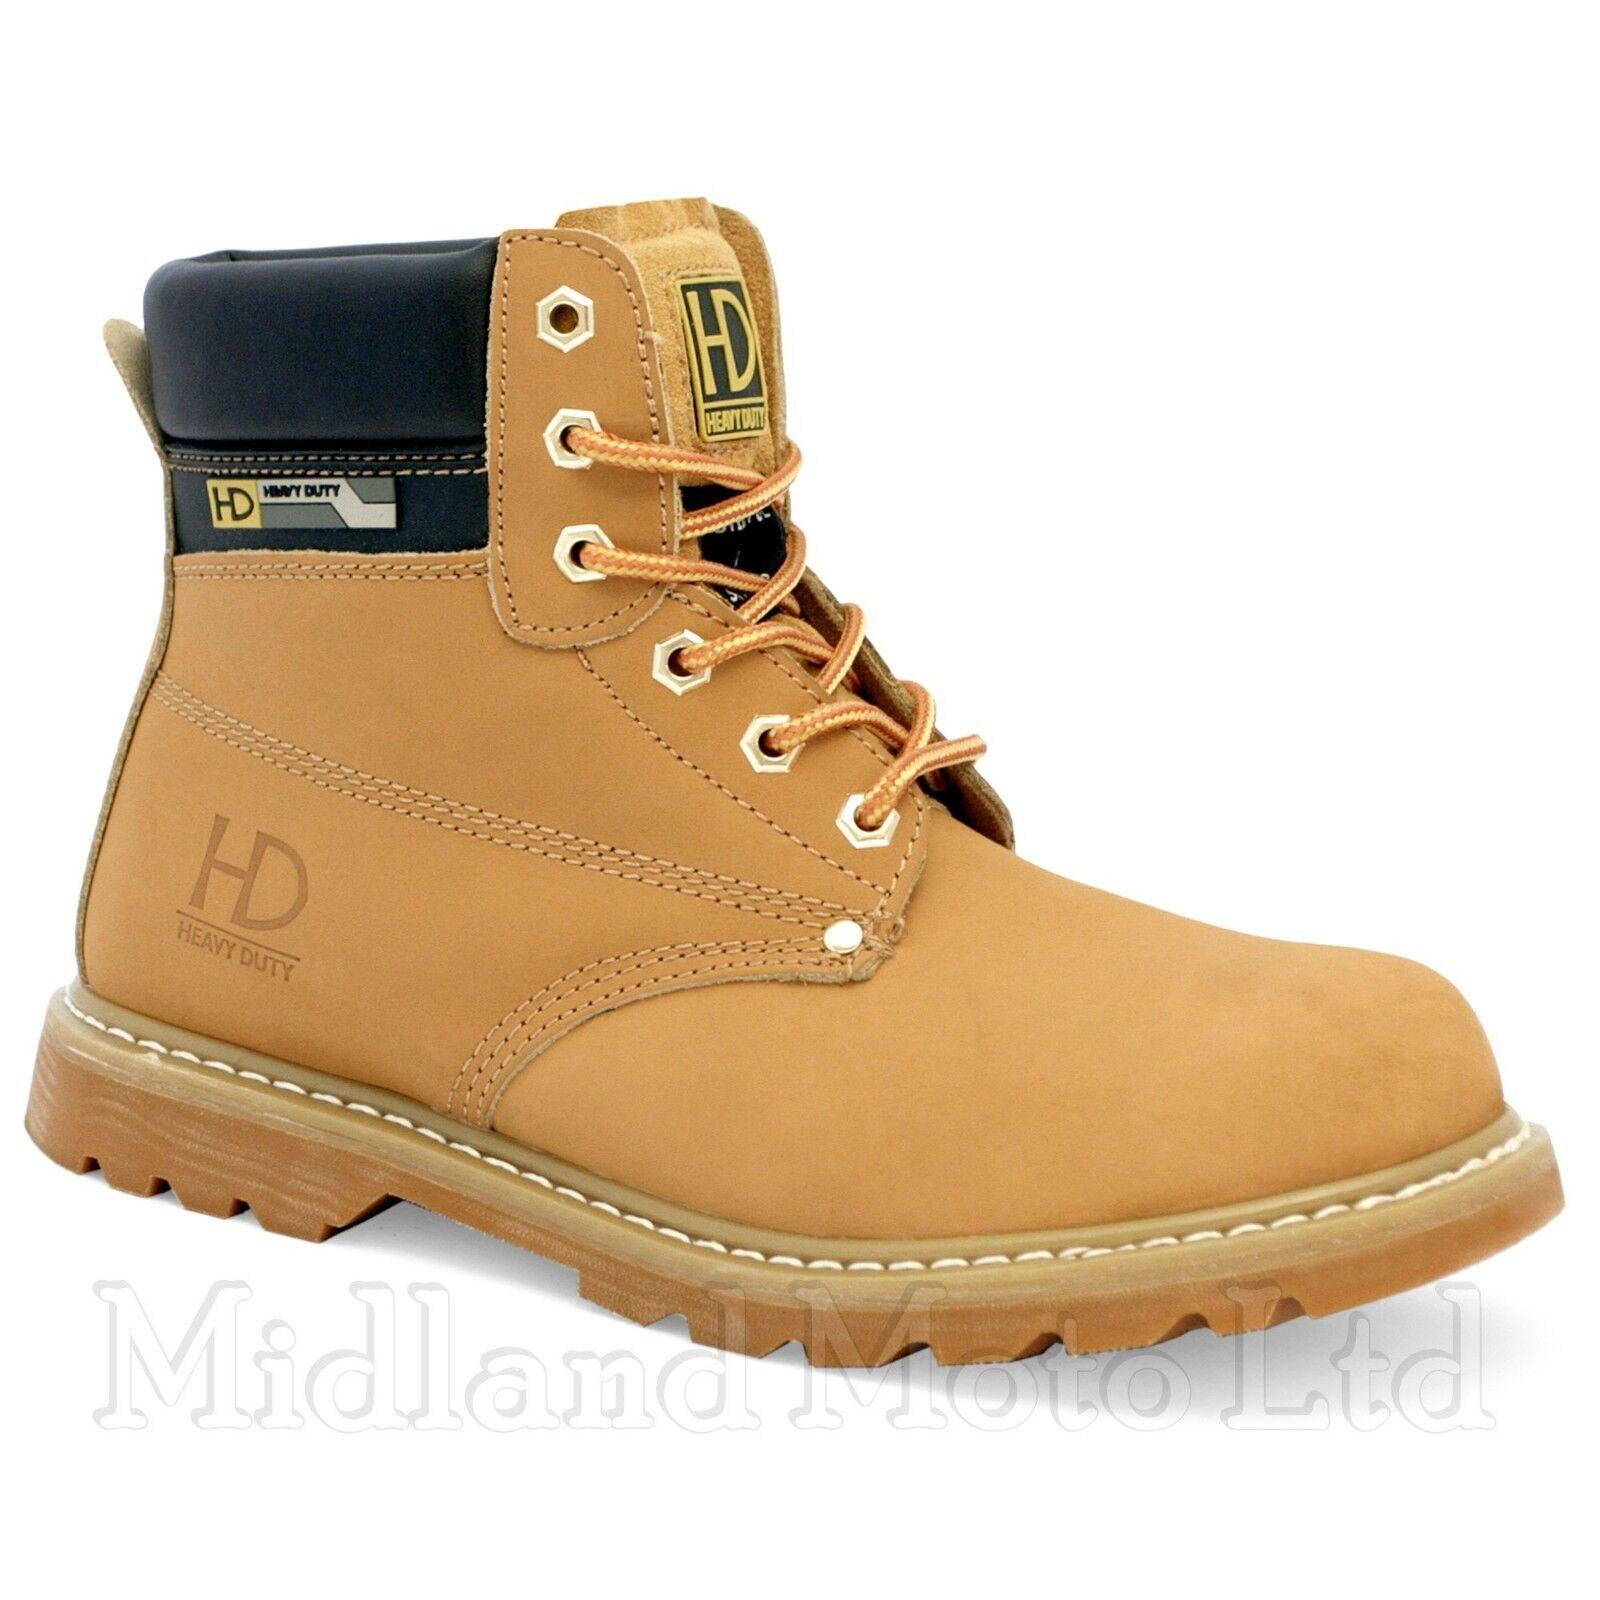 Heavy Duty Gelb Leather Steel Toe Cap SBP Safety Stiefel